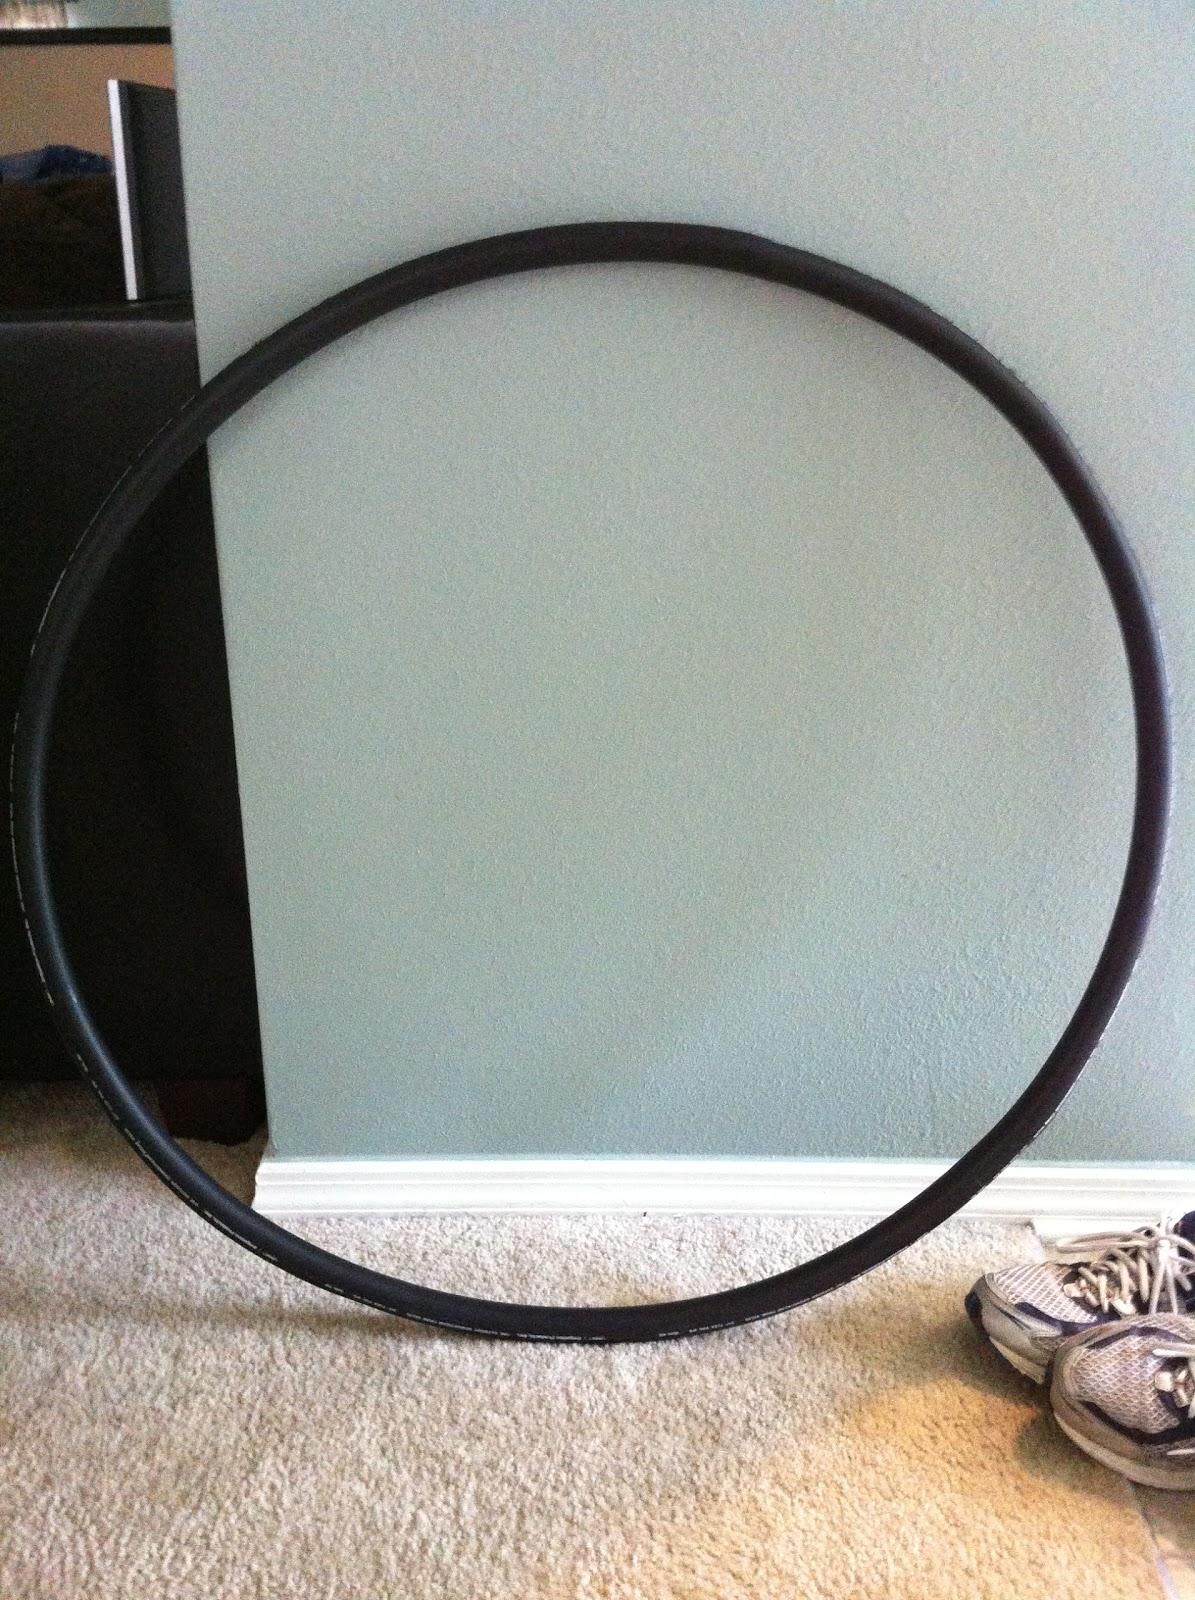 DIY Projects: DIY Weighted Hula Hoop